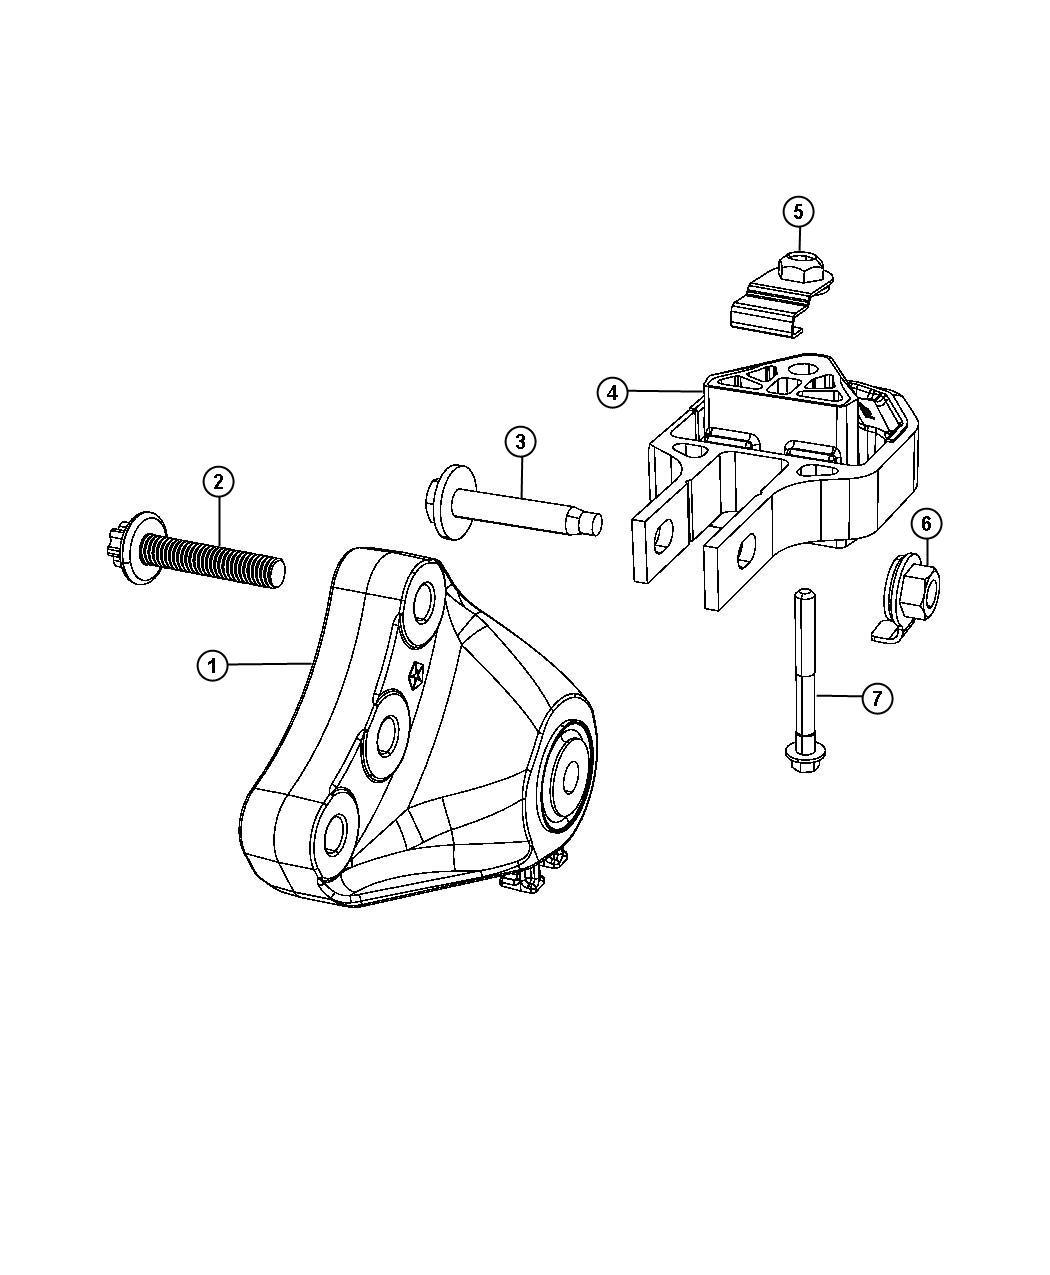 2013 Dodge Dart Bracket. Engine mount. Module, train